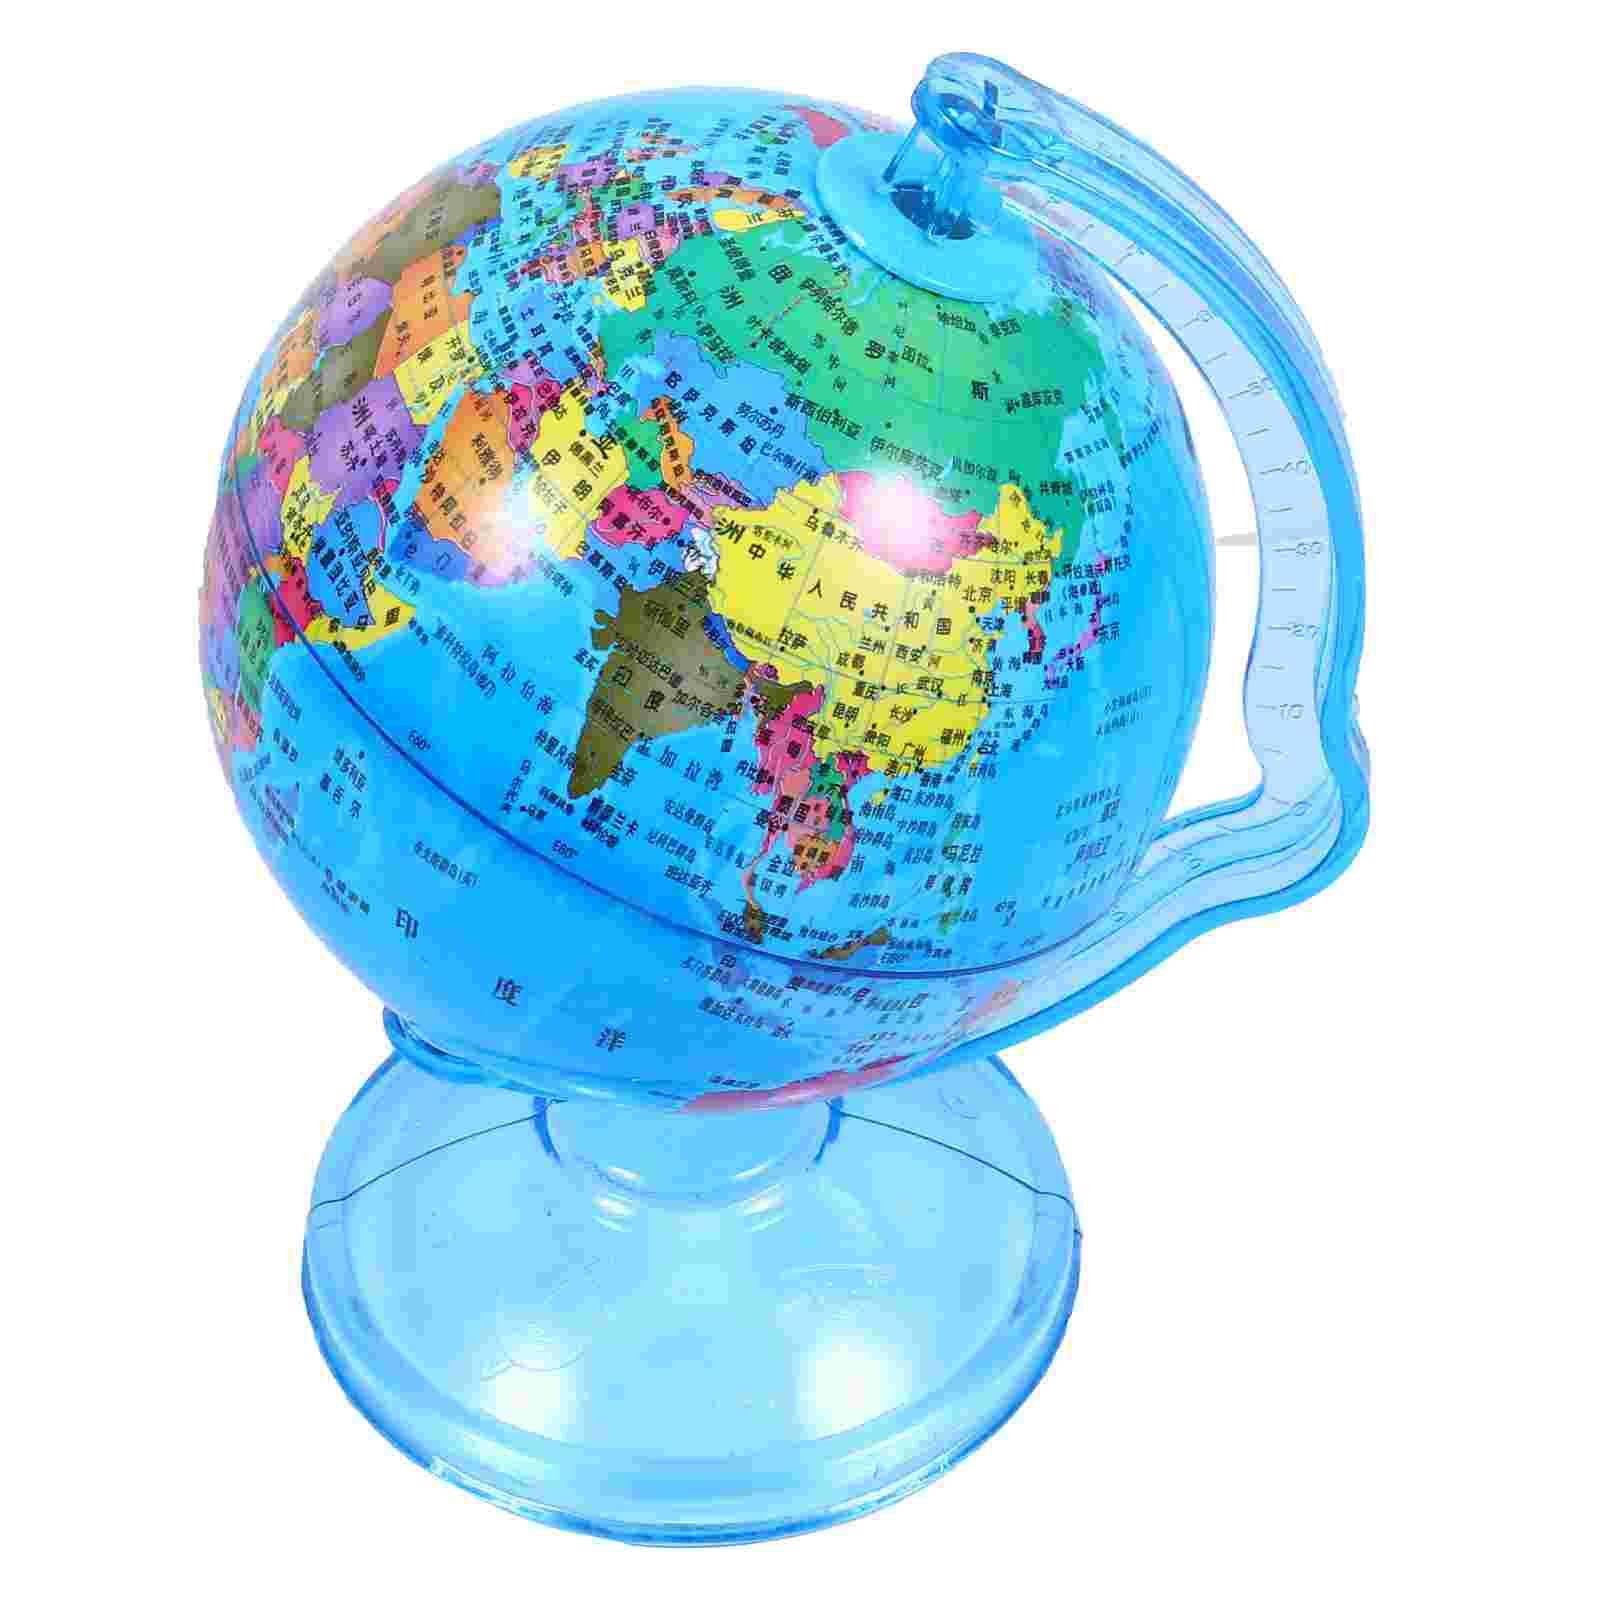 1Pc Coin Savings Pot Creative Coin Money Bank Globe Coin Storage Jar